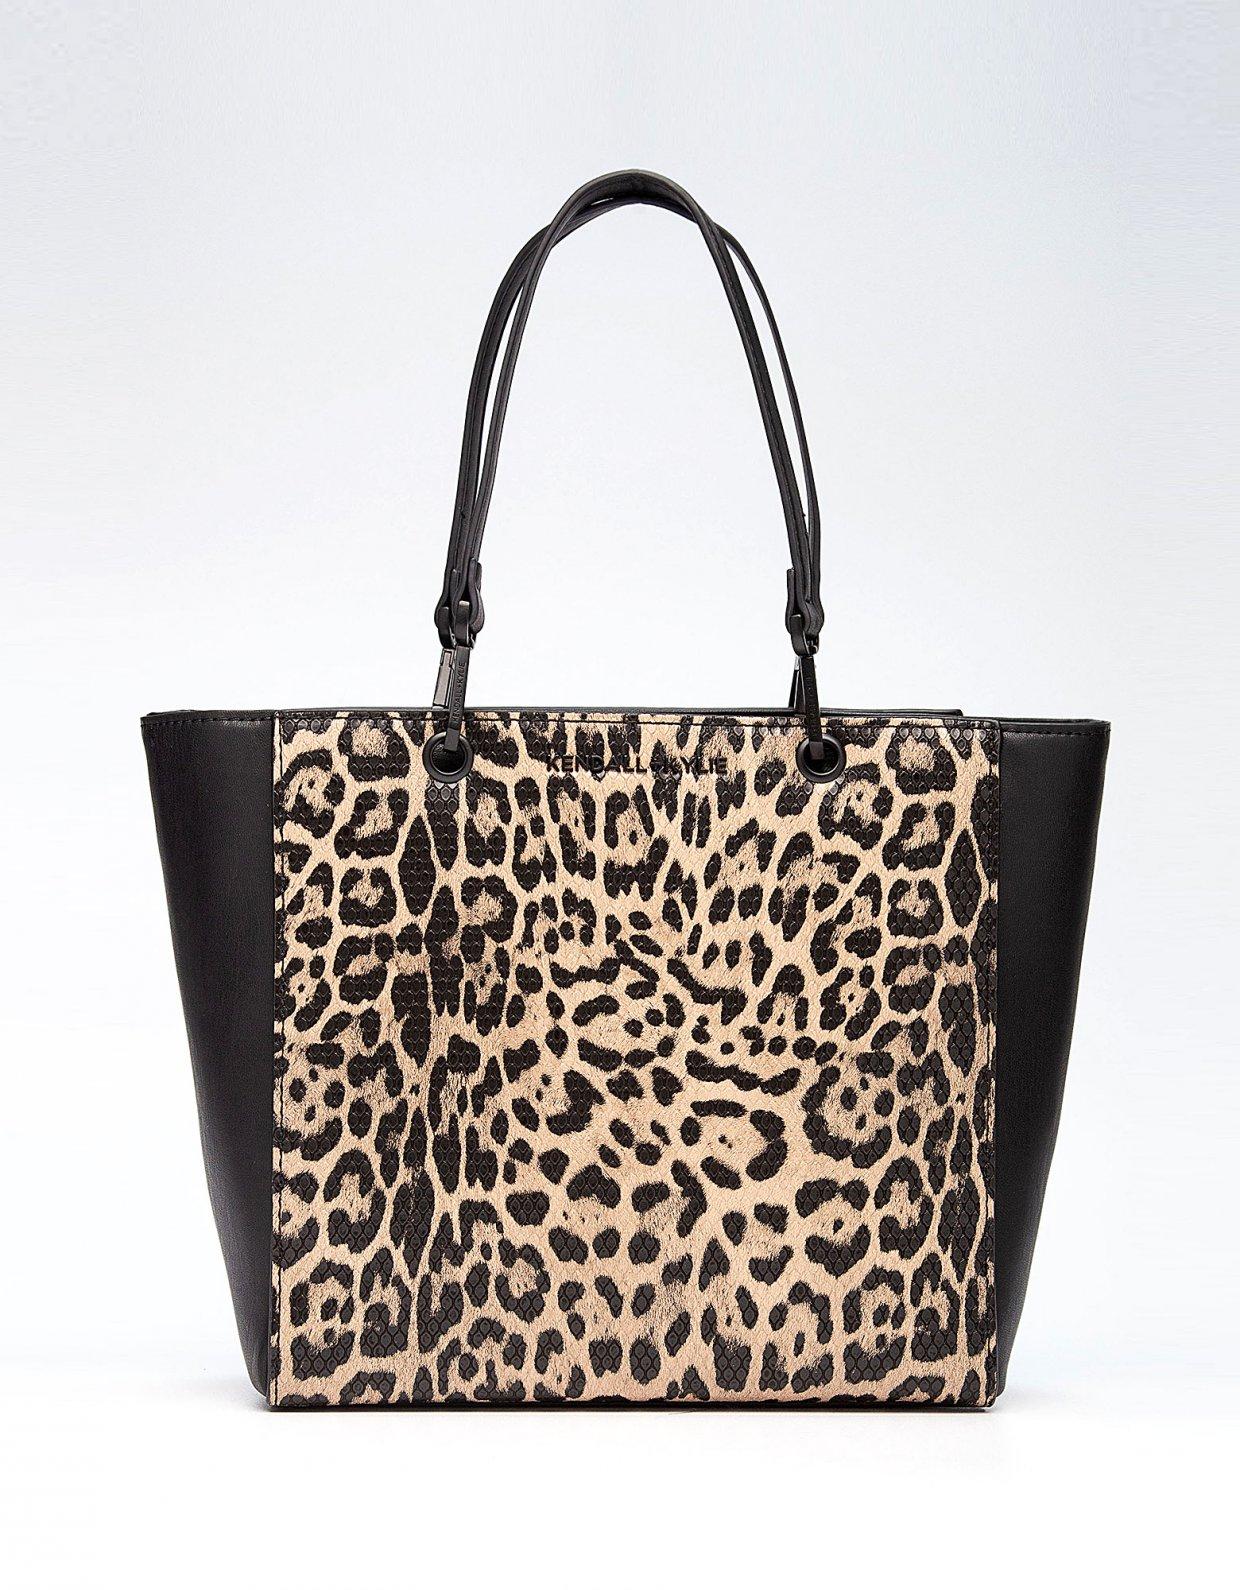 Kendall + Kylie Sarahya tote bag leopard